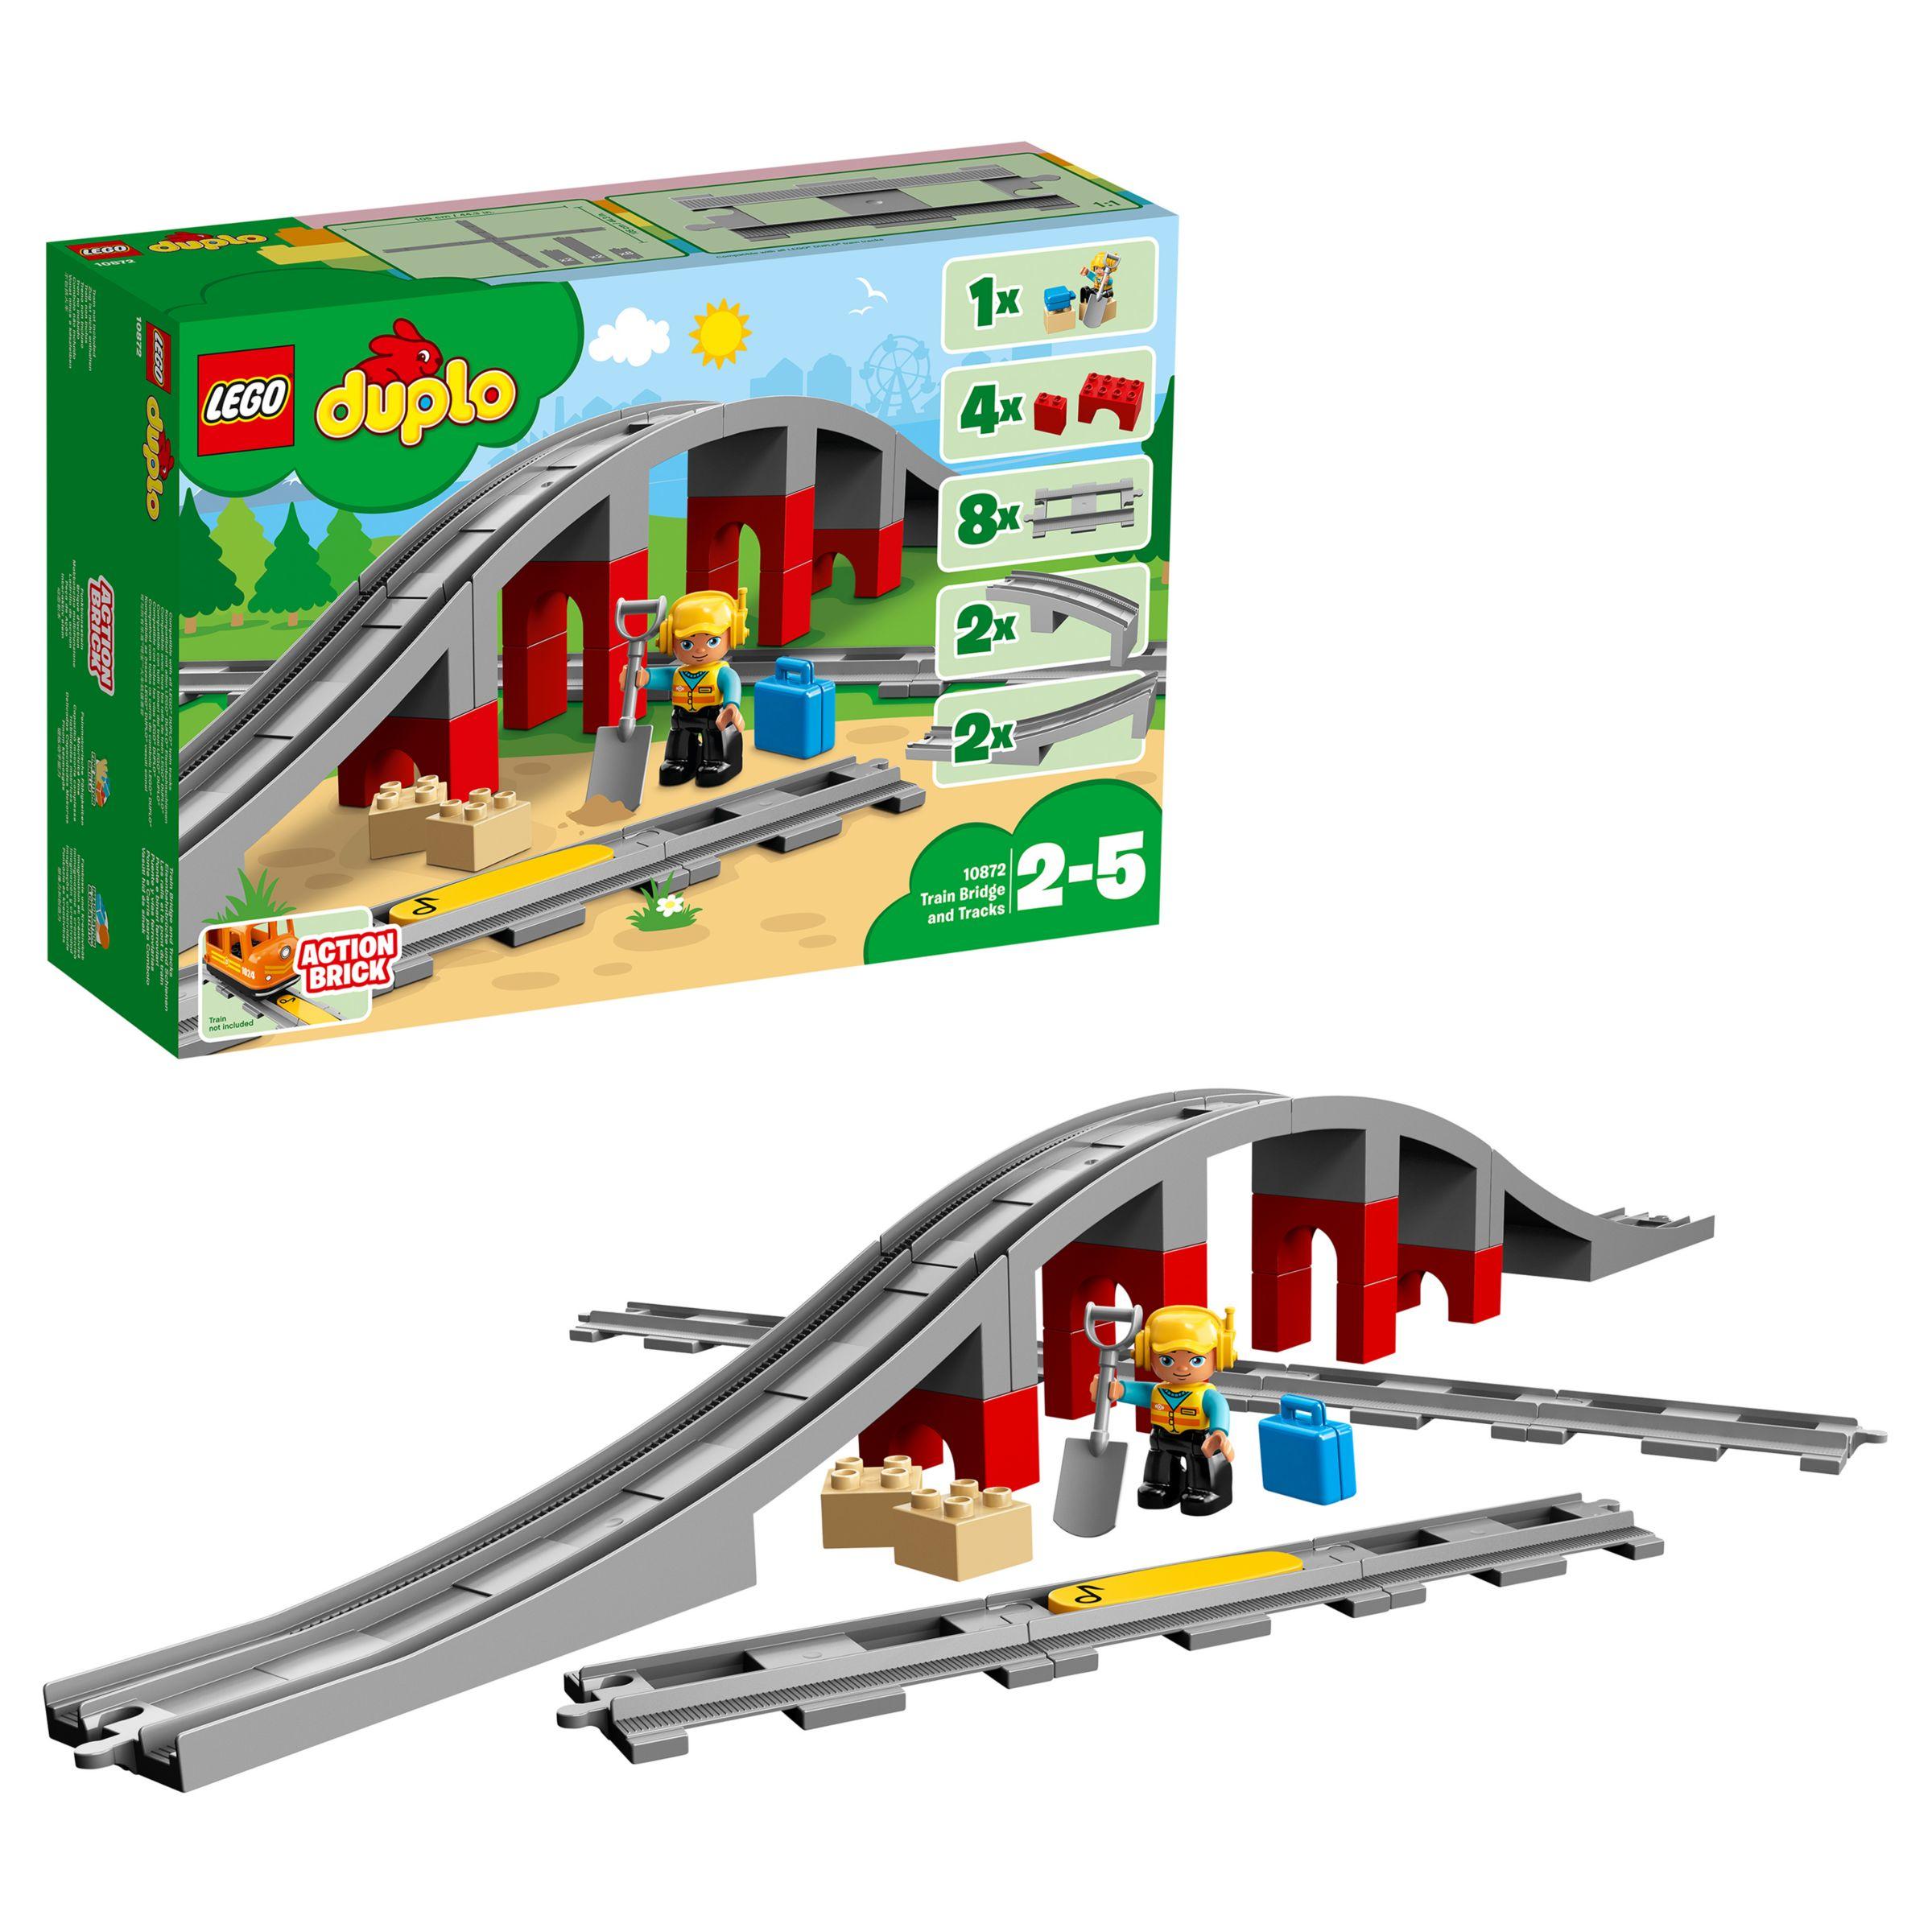 Lego LEGO DUPLO 10872 Train Bridge & Tracks